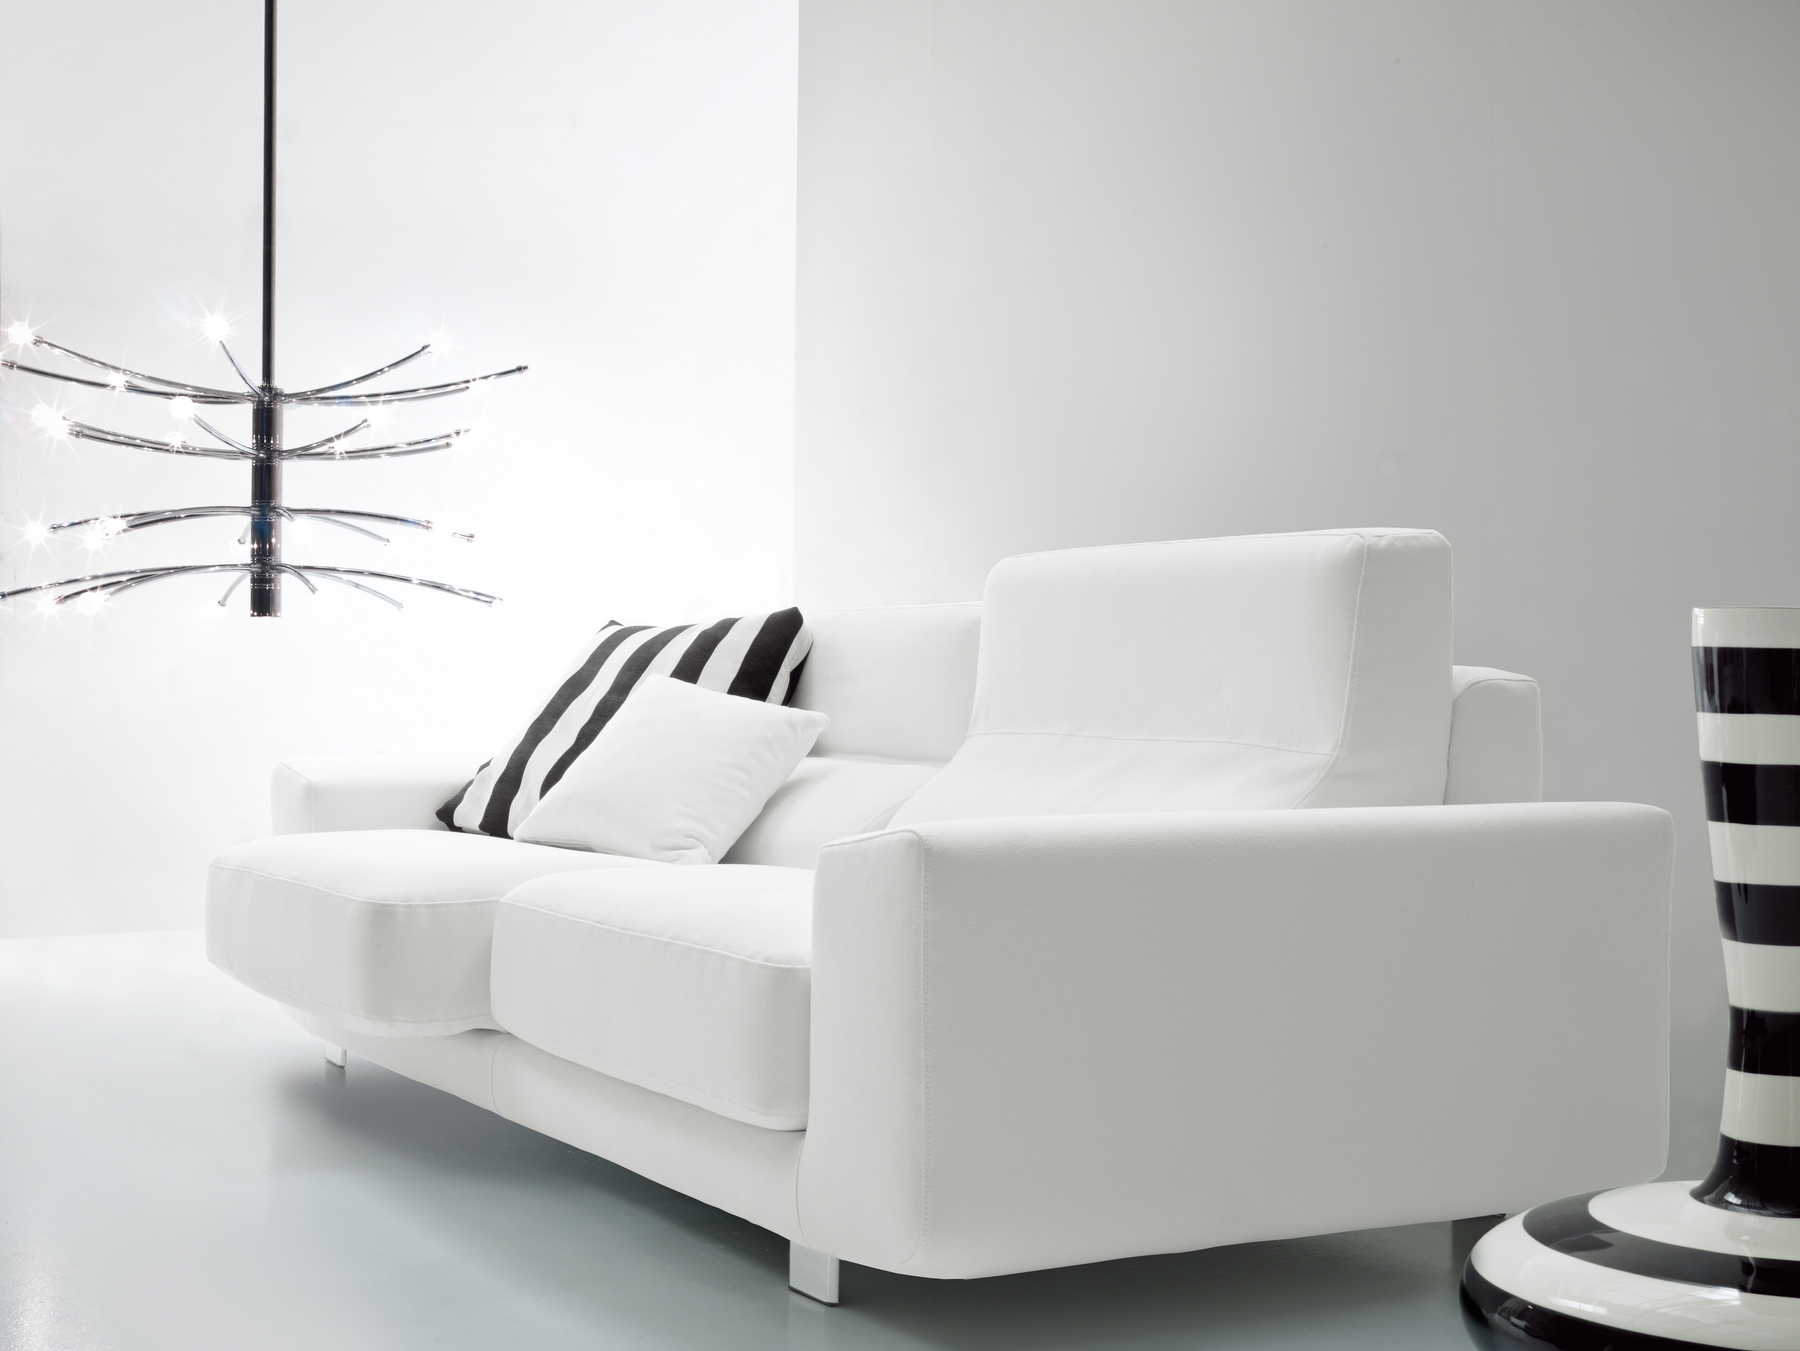 Klaus divano in tessuto by bontempi casa design daniele for Divano klaus